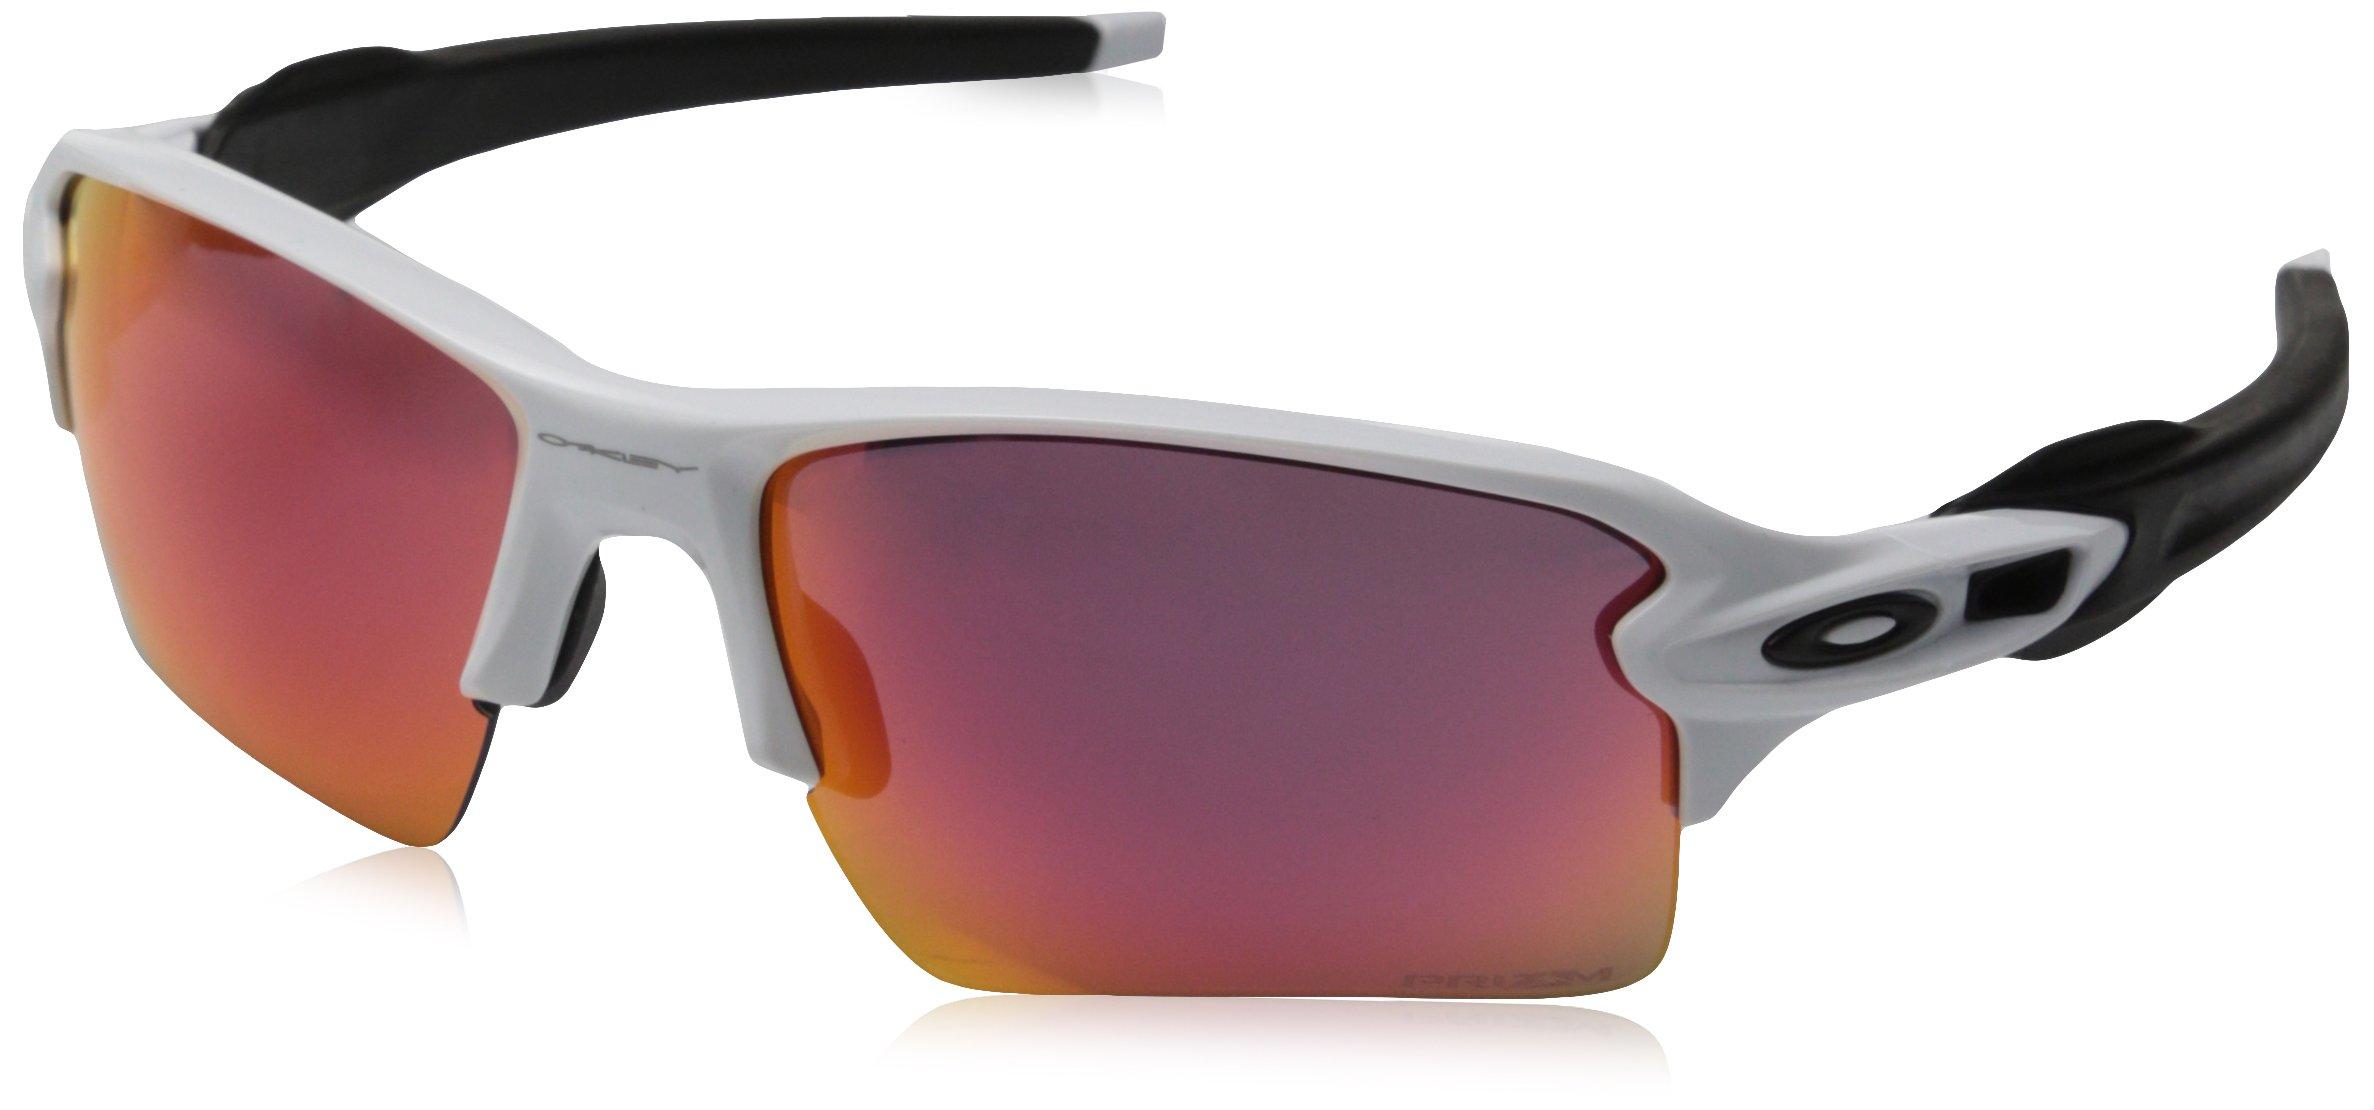 Oakley Men's Flak 2.0 XL OO9188-03 Rectangular Sunglasses, Polished White, 59 mm